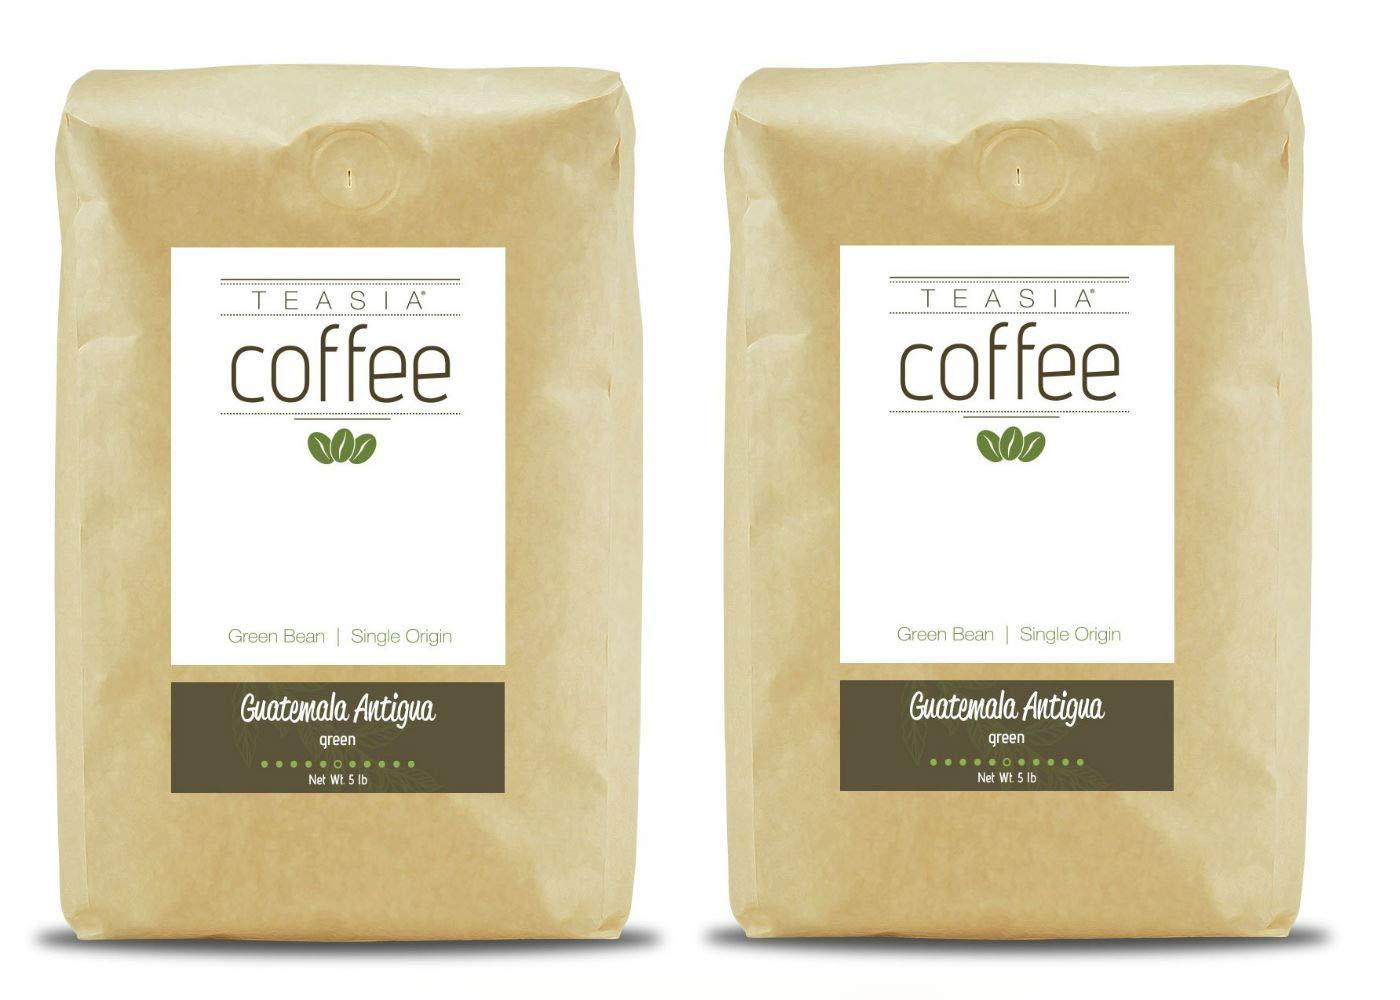 Teasia Coffee, Guatemala Antigua, 2-Pack, Single Origin, Green Unroasted Whole Coffee Beans, 5-Pound Bag by Teasia